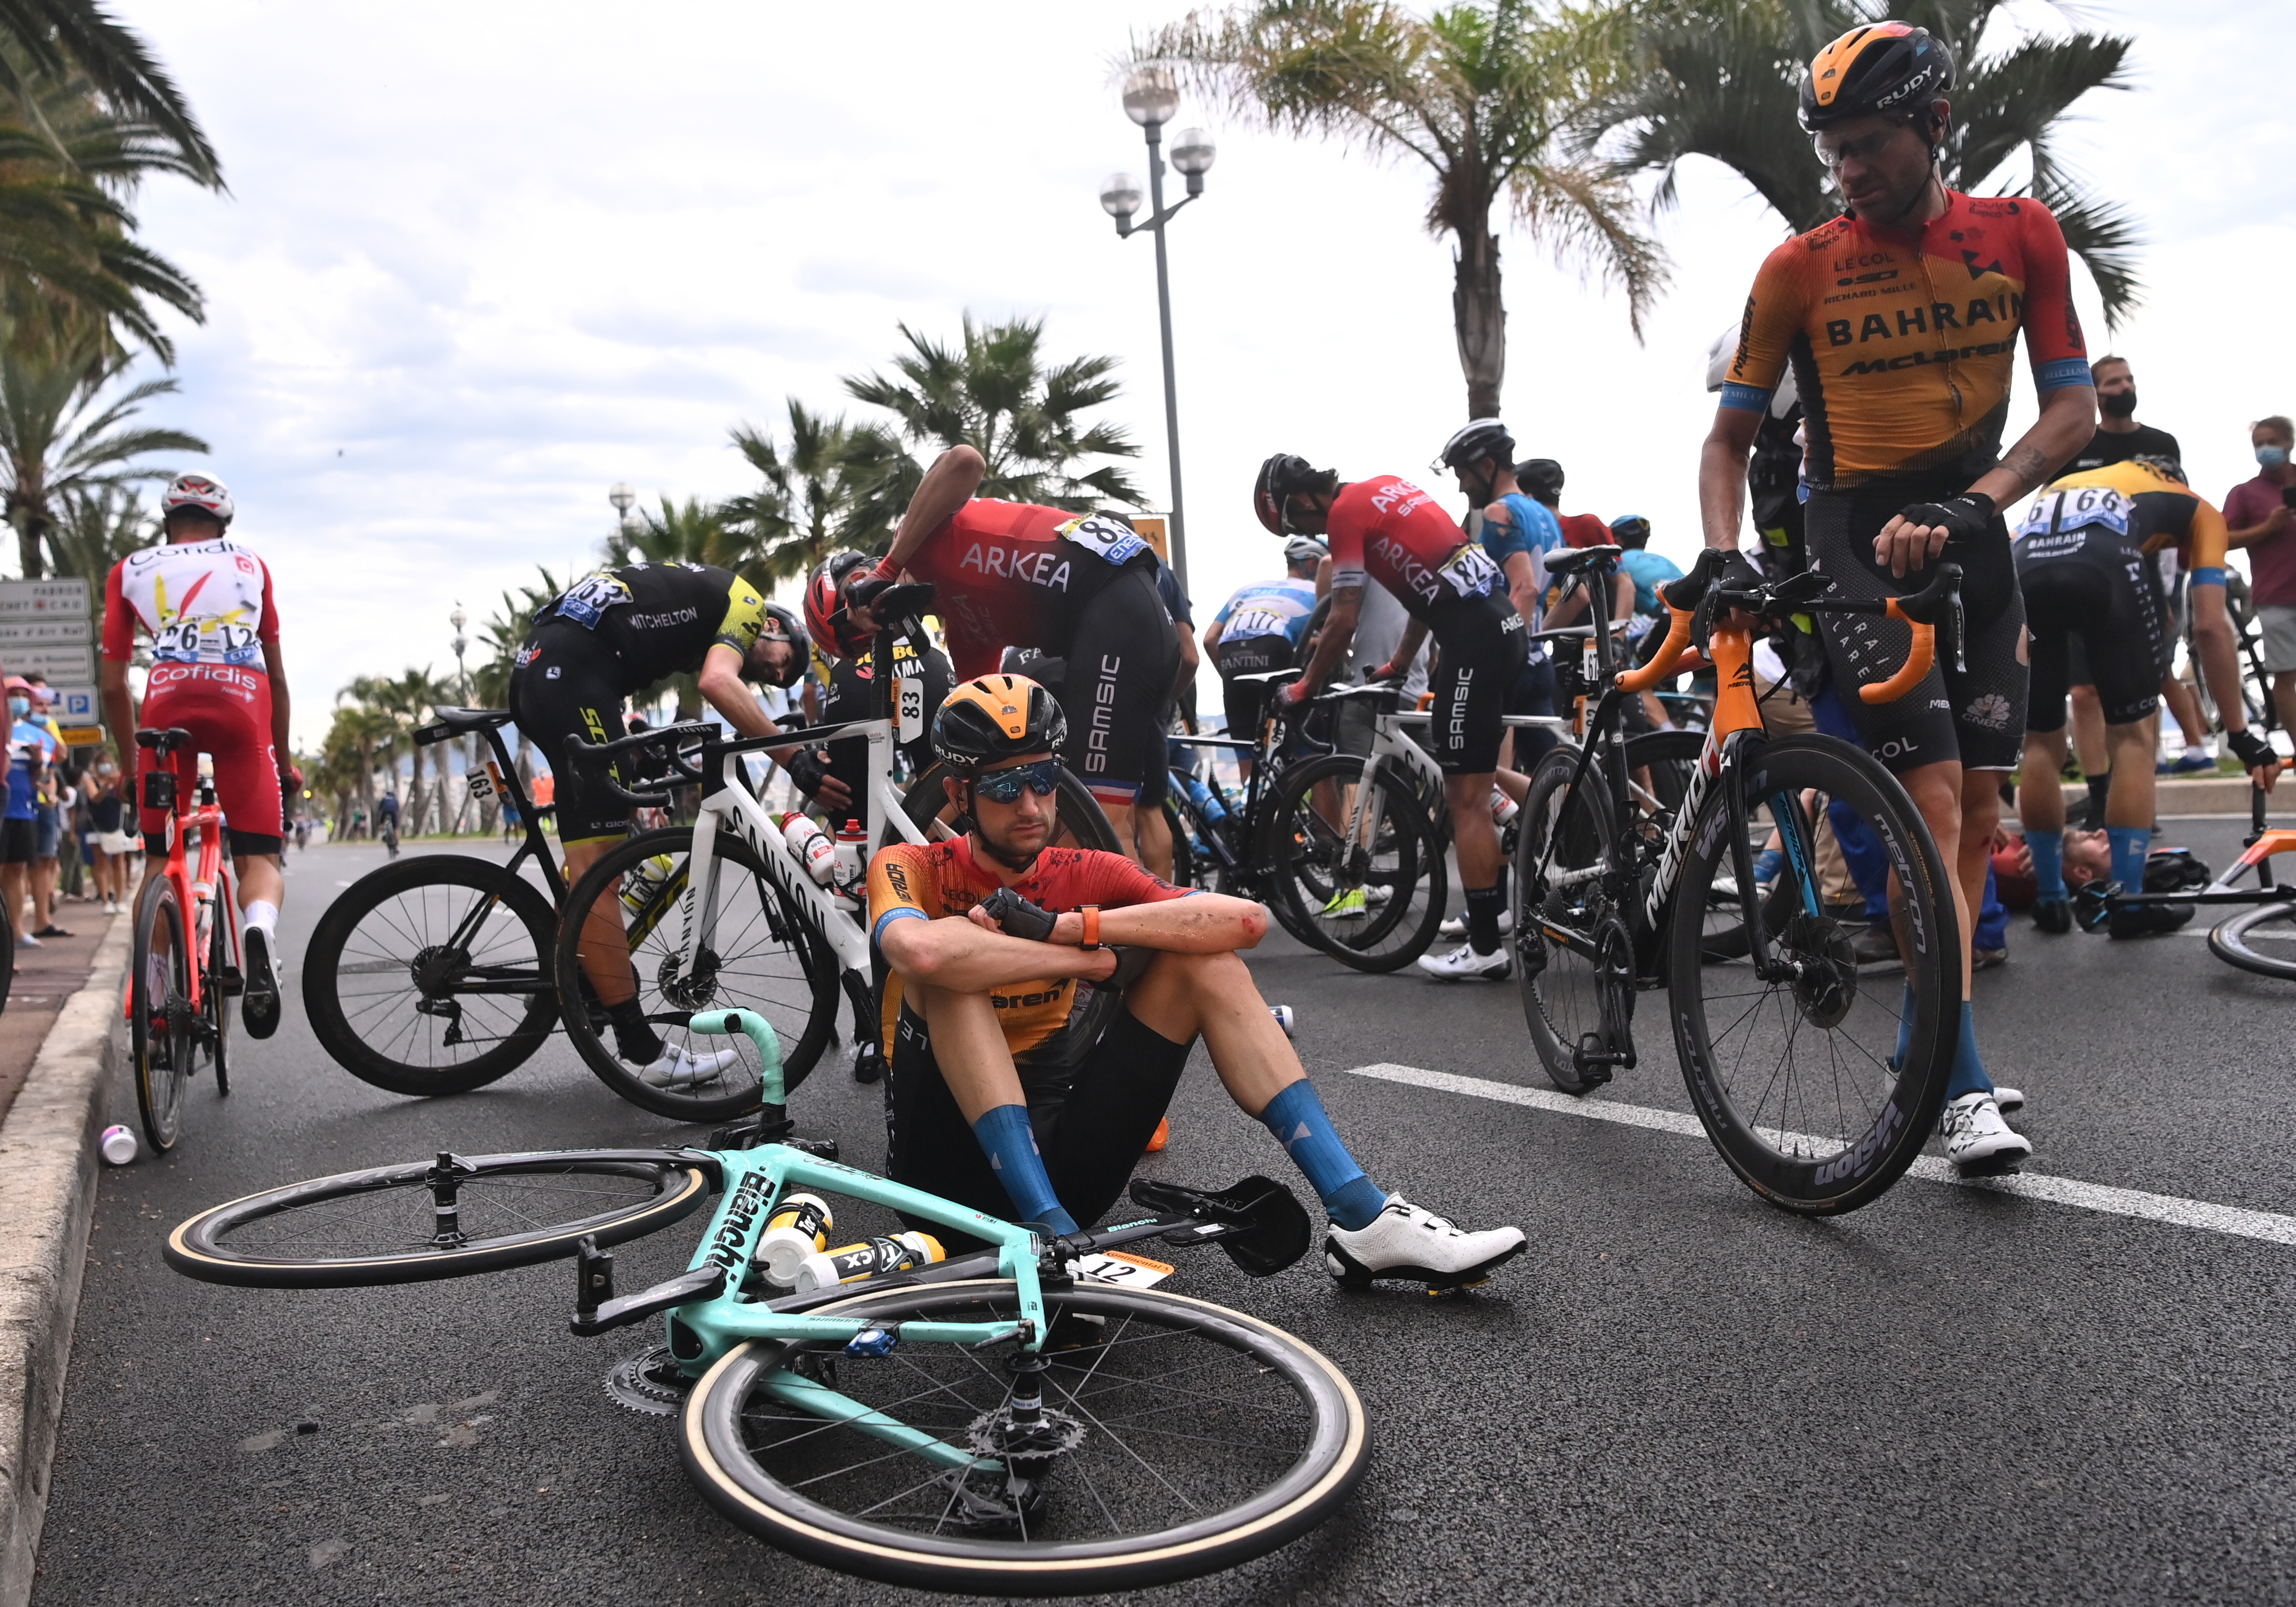 Foto van de Tour de France